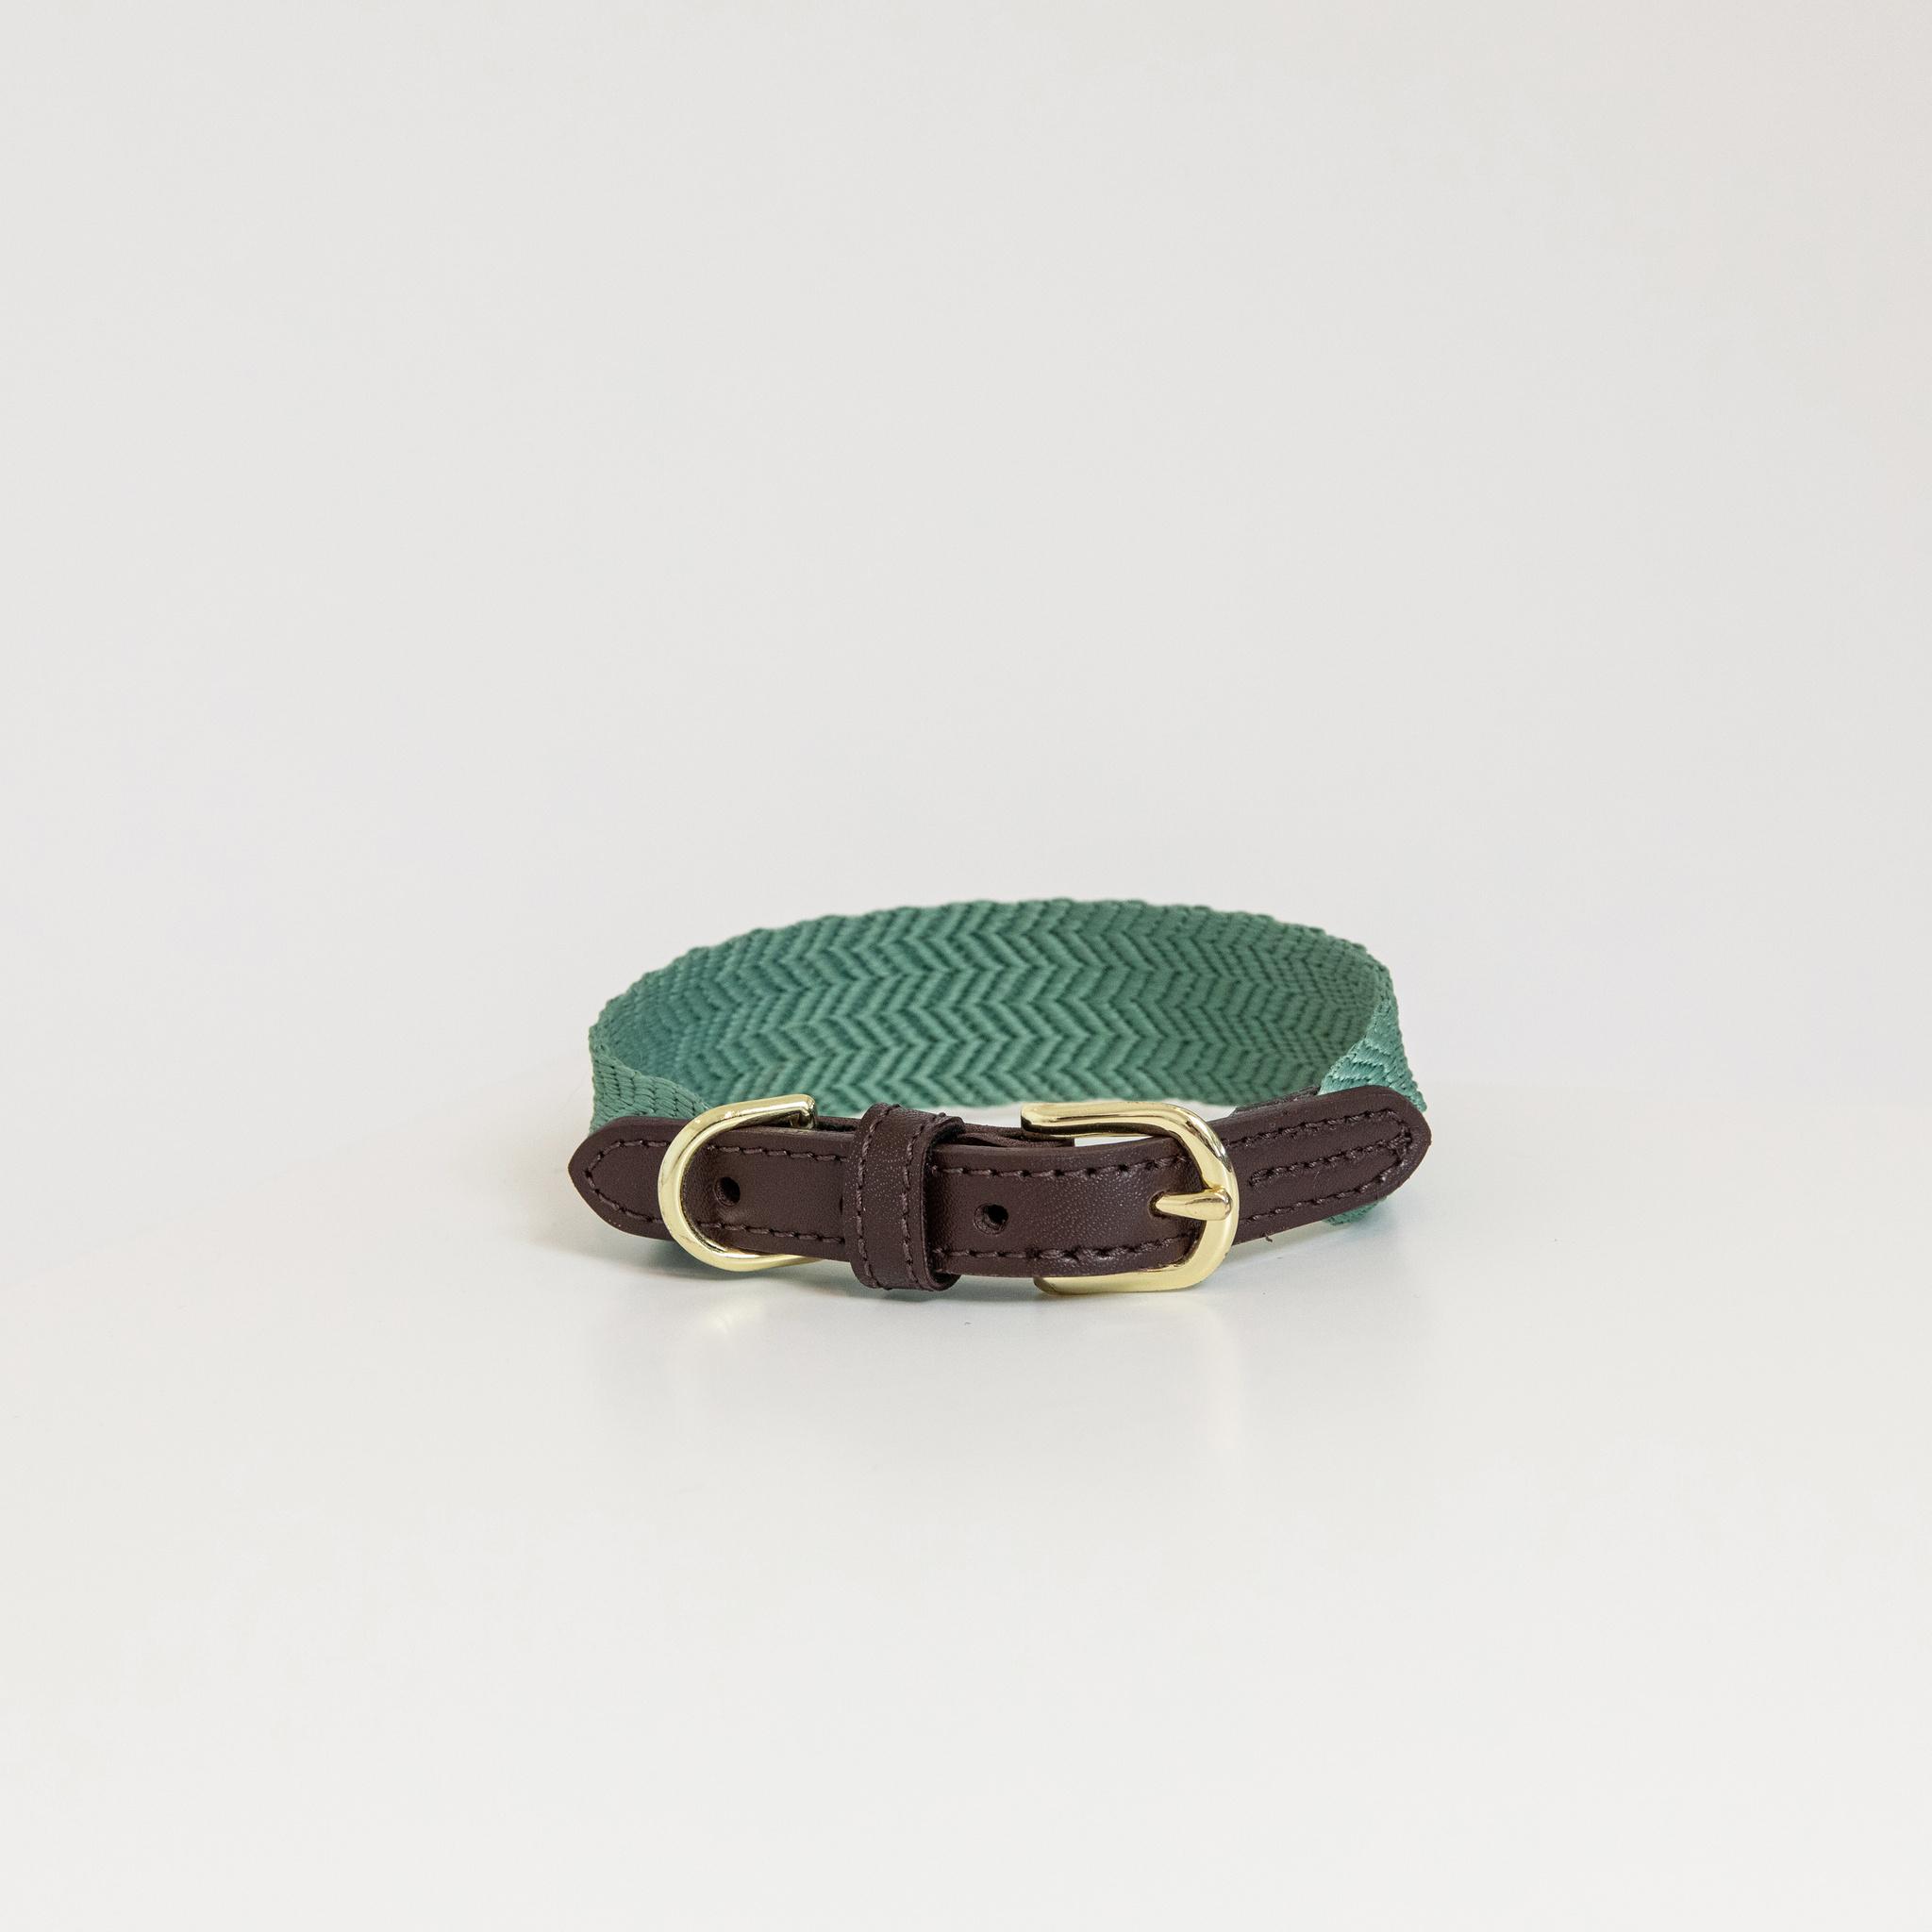 Kentucky Dogwear Jacquard Hundehalsband